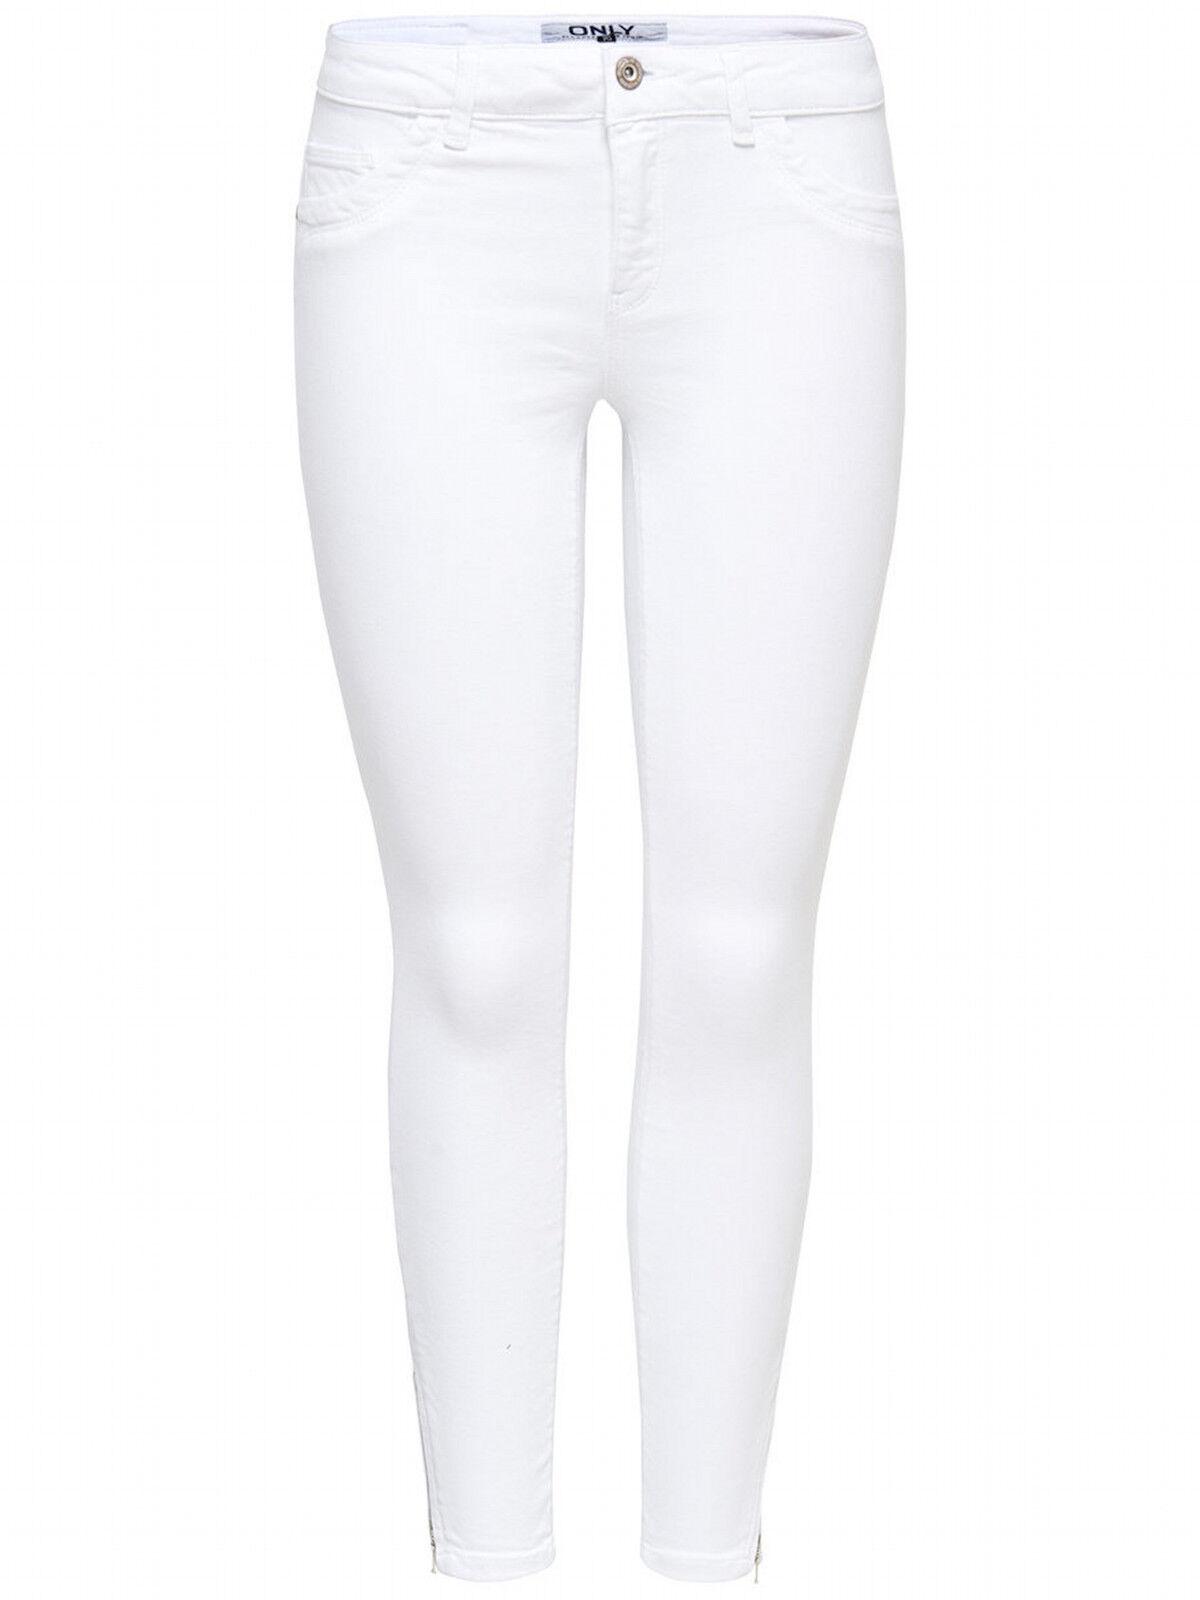 Only Damen Jeans Hose Regular Ankle Skinny-Jeans weiß Stretch NEU